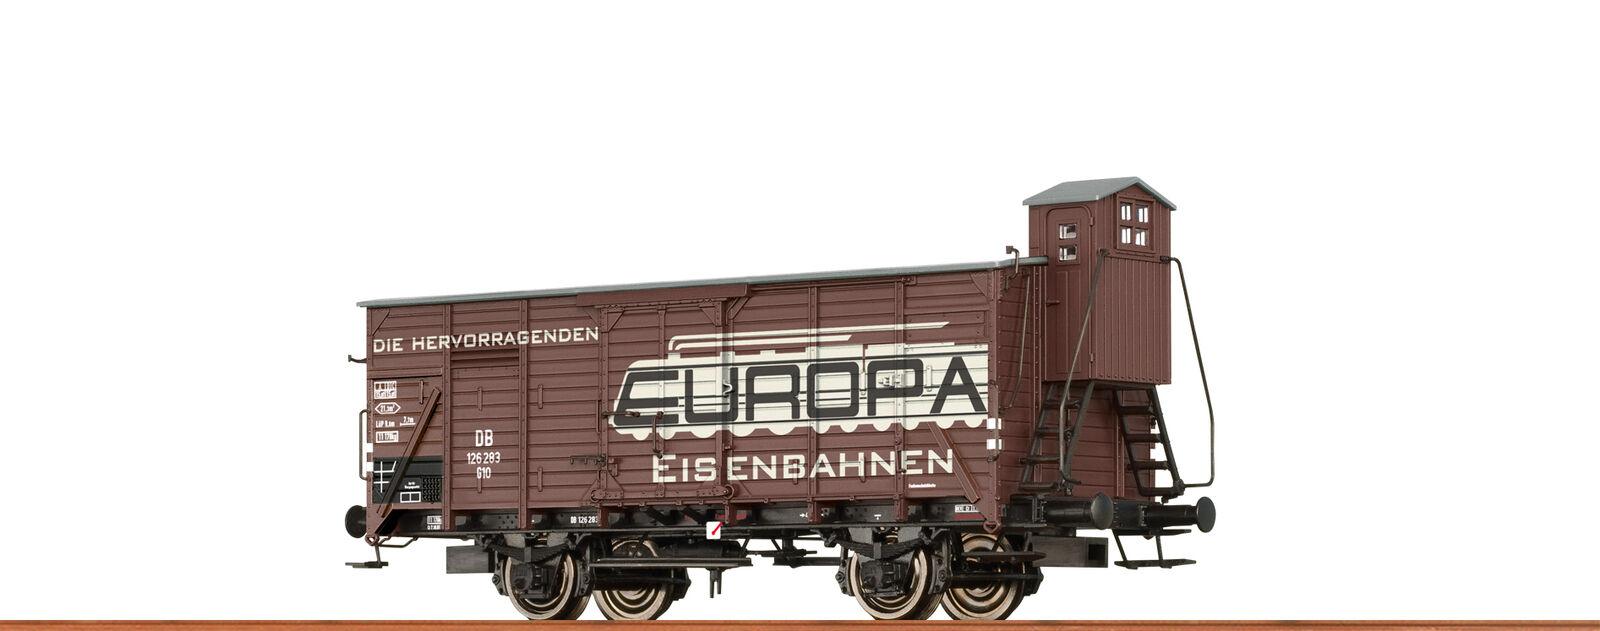 Brawa 49747 Gauge H0 Freight Car G10 Db, III, Europa Spielwaren Dc